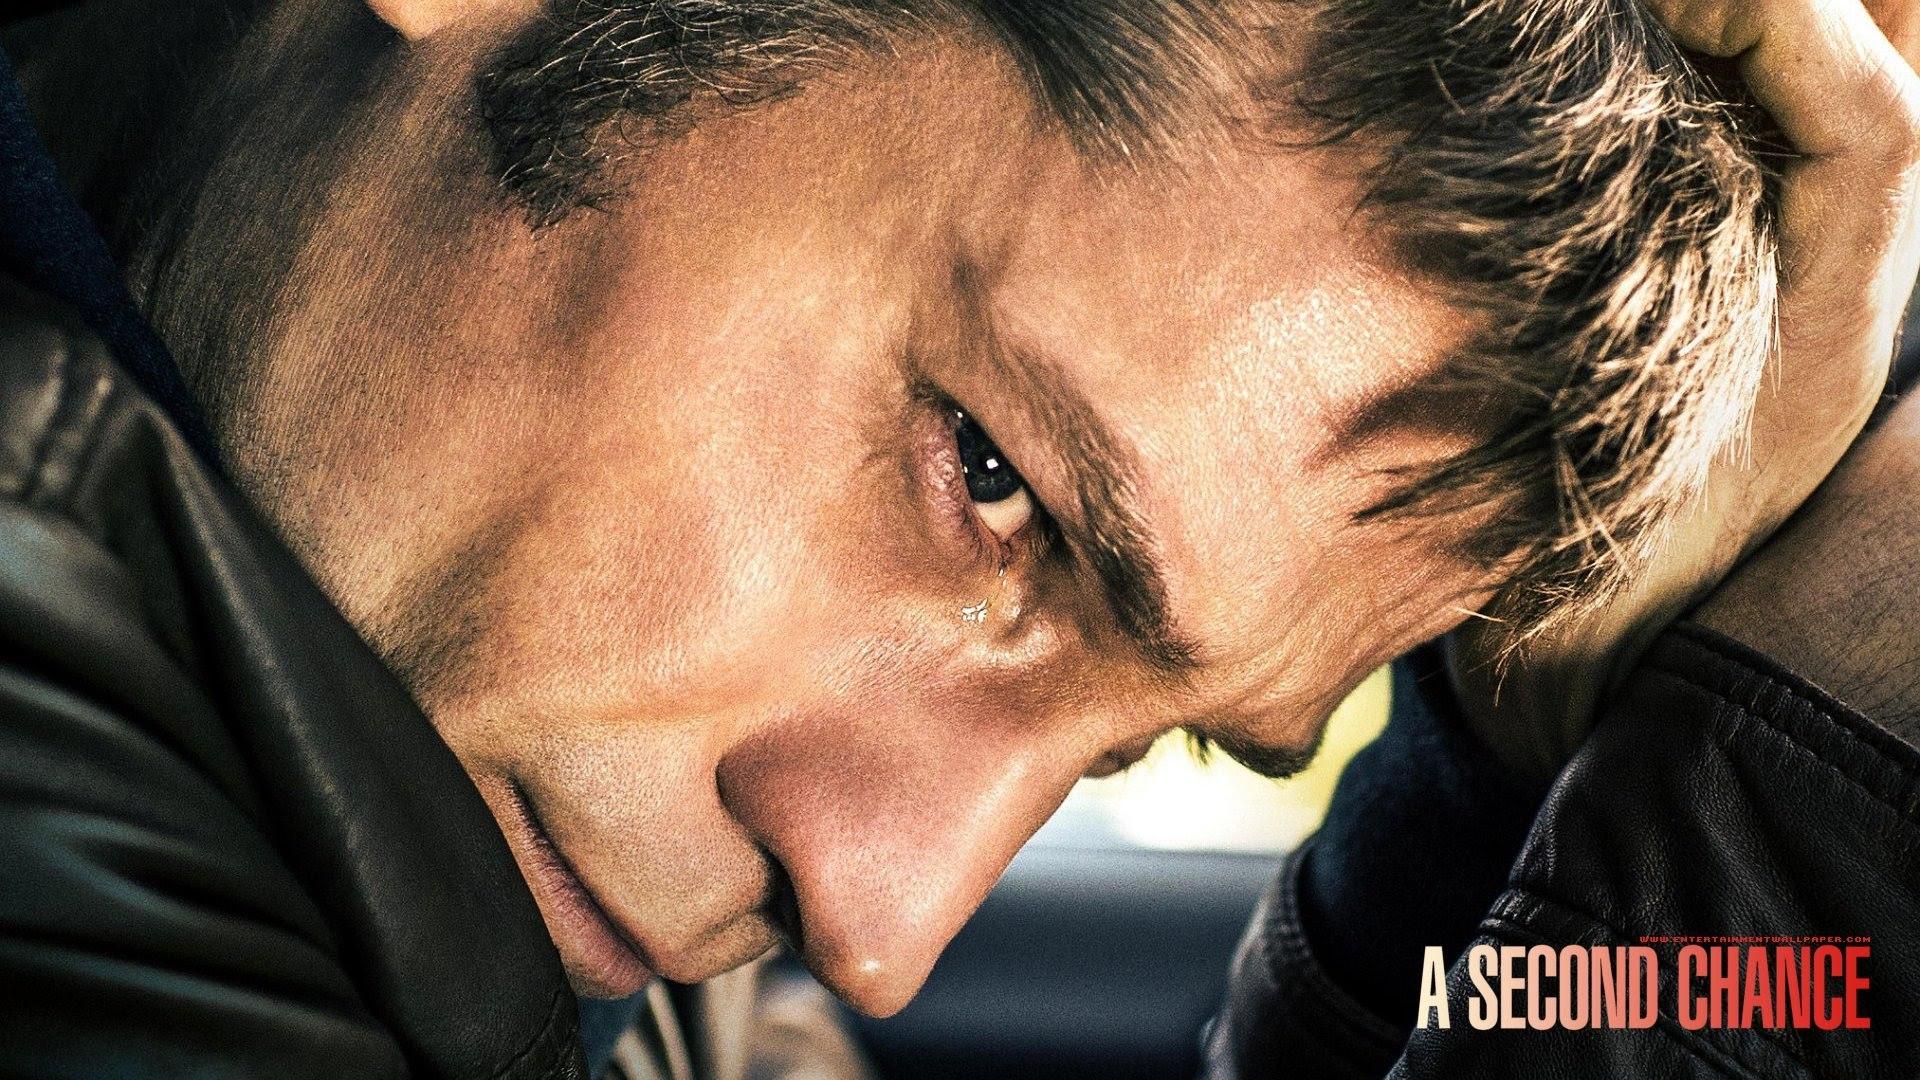 A Second Chance (En chance til) - Trailer / Bande-annonce [English Sub|HD] (Nikolaj Coster-Waldau)